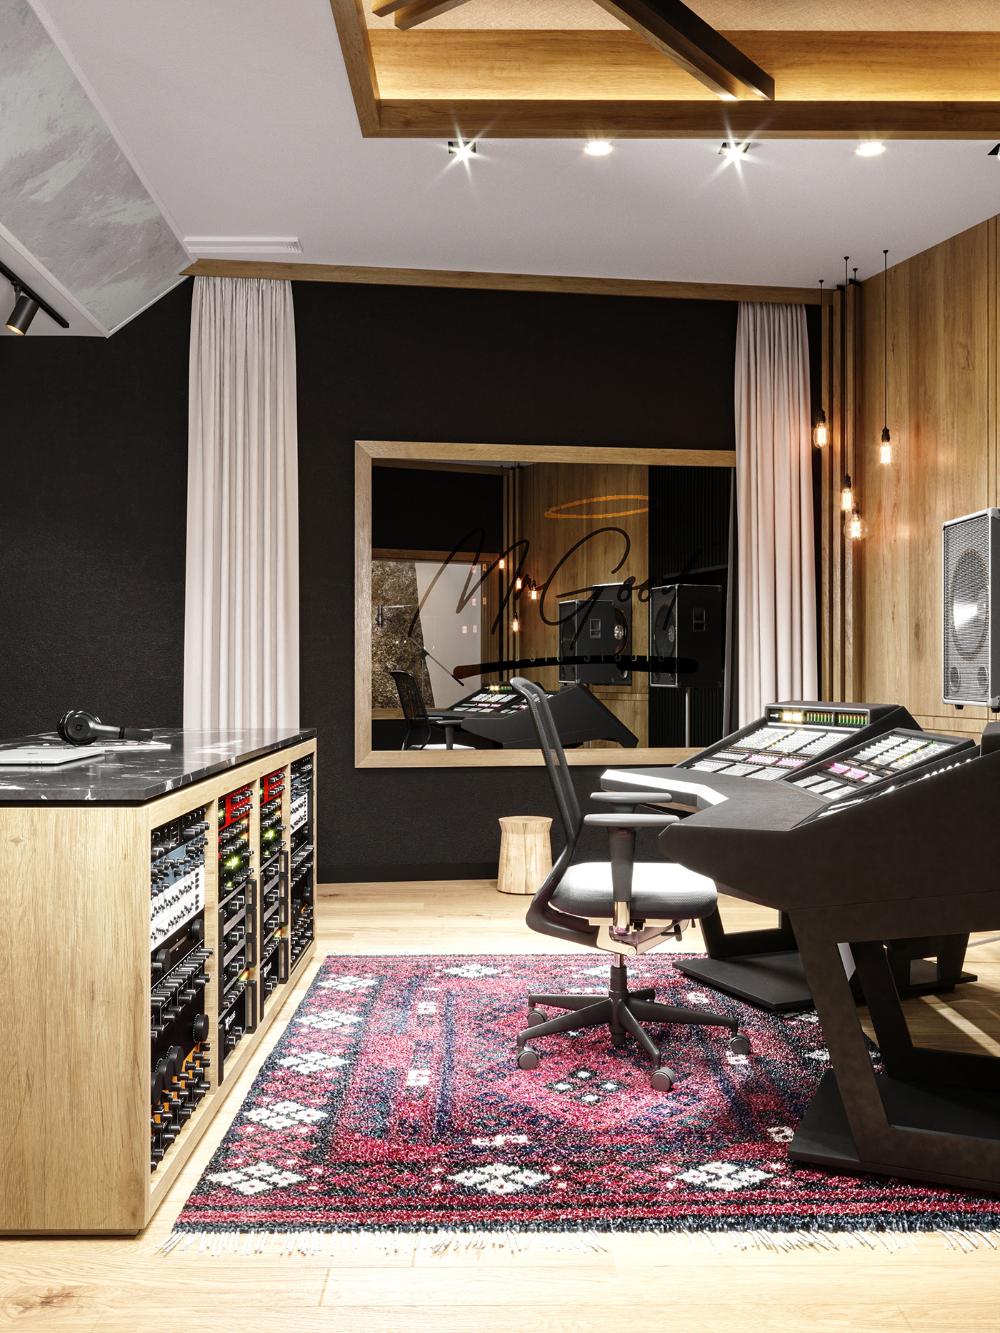 Autodesk Room Design: Mr Good Studio On Behance (With Images)